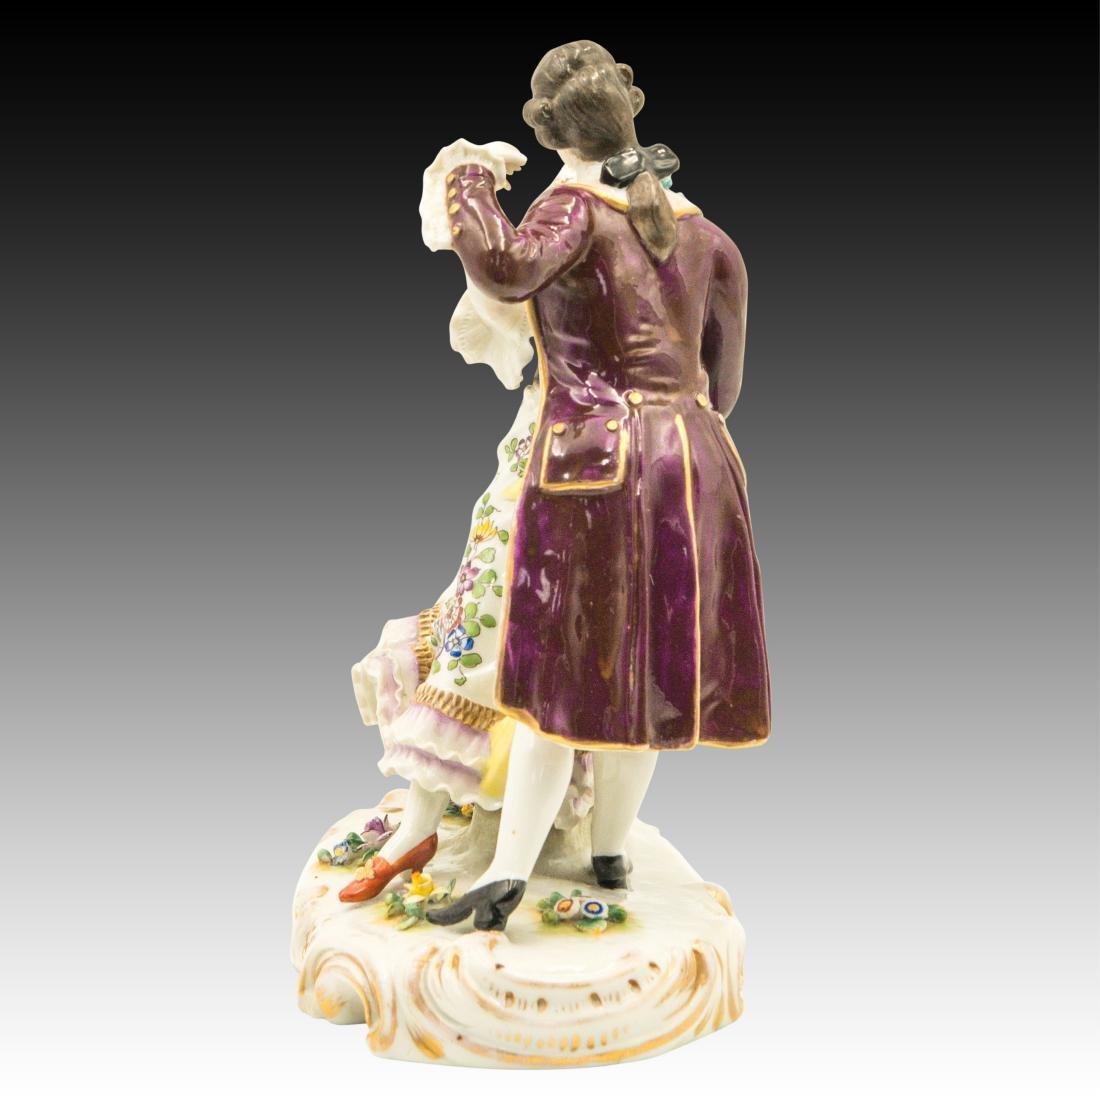 Sitzendorf French Style Dancing Couple Figurine - 2